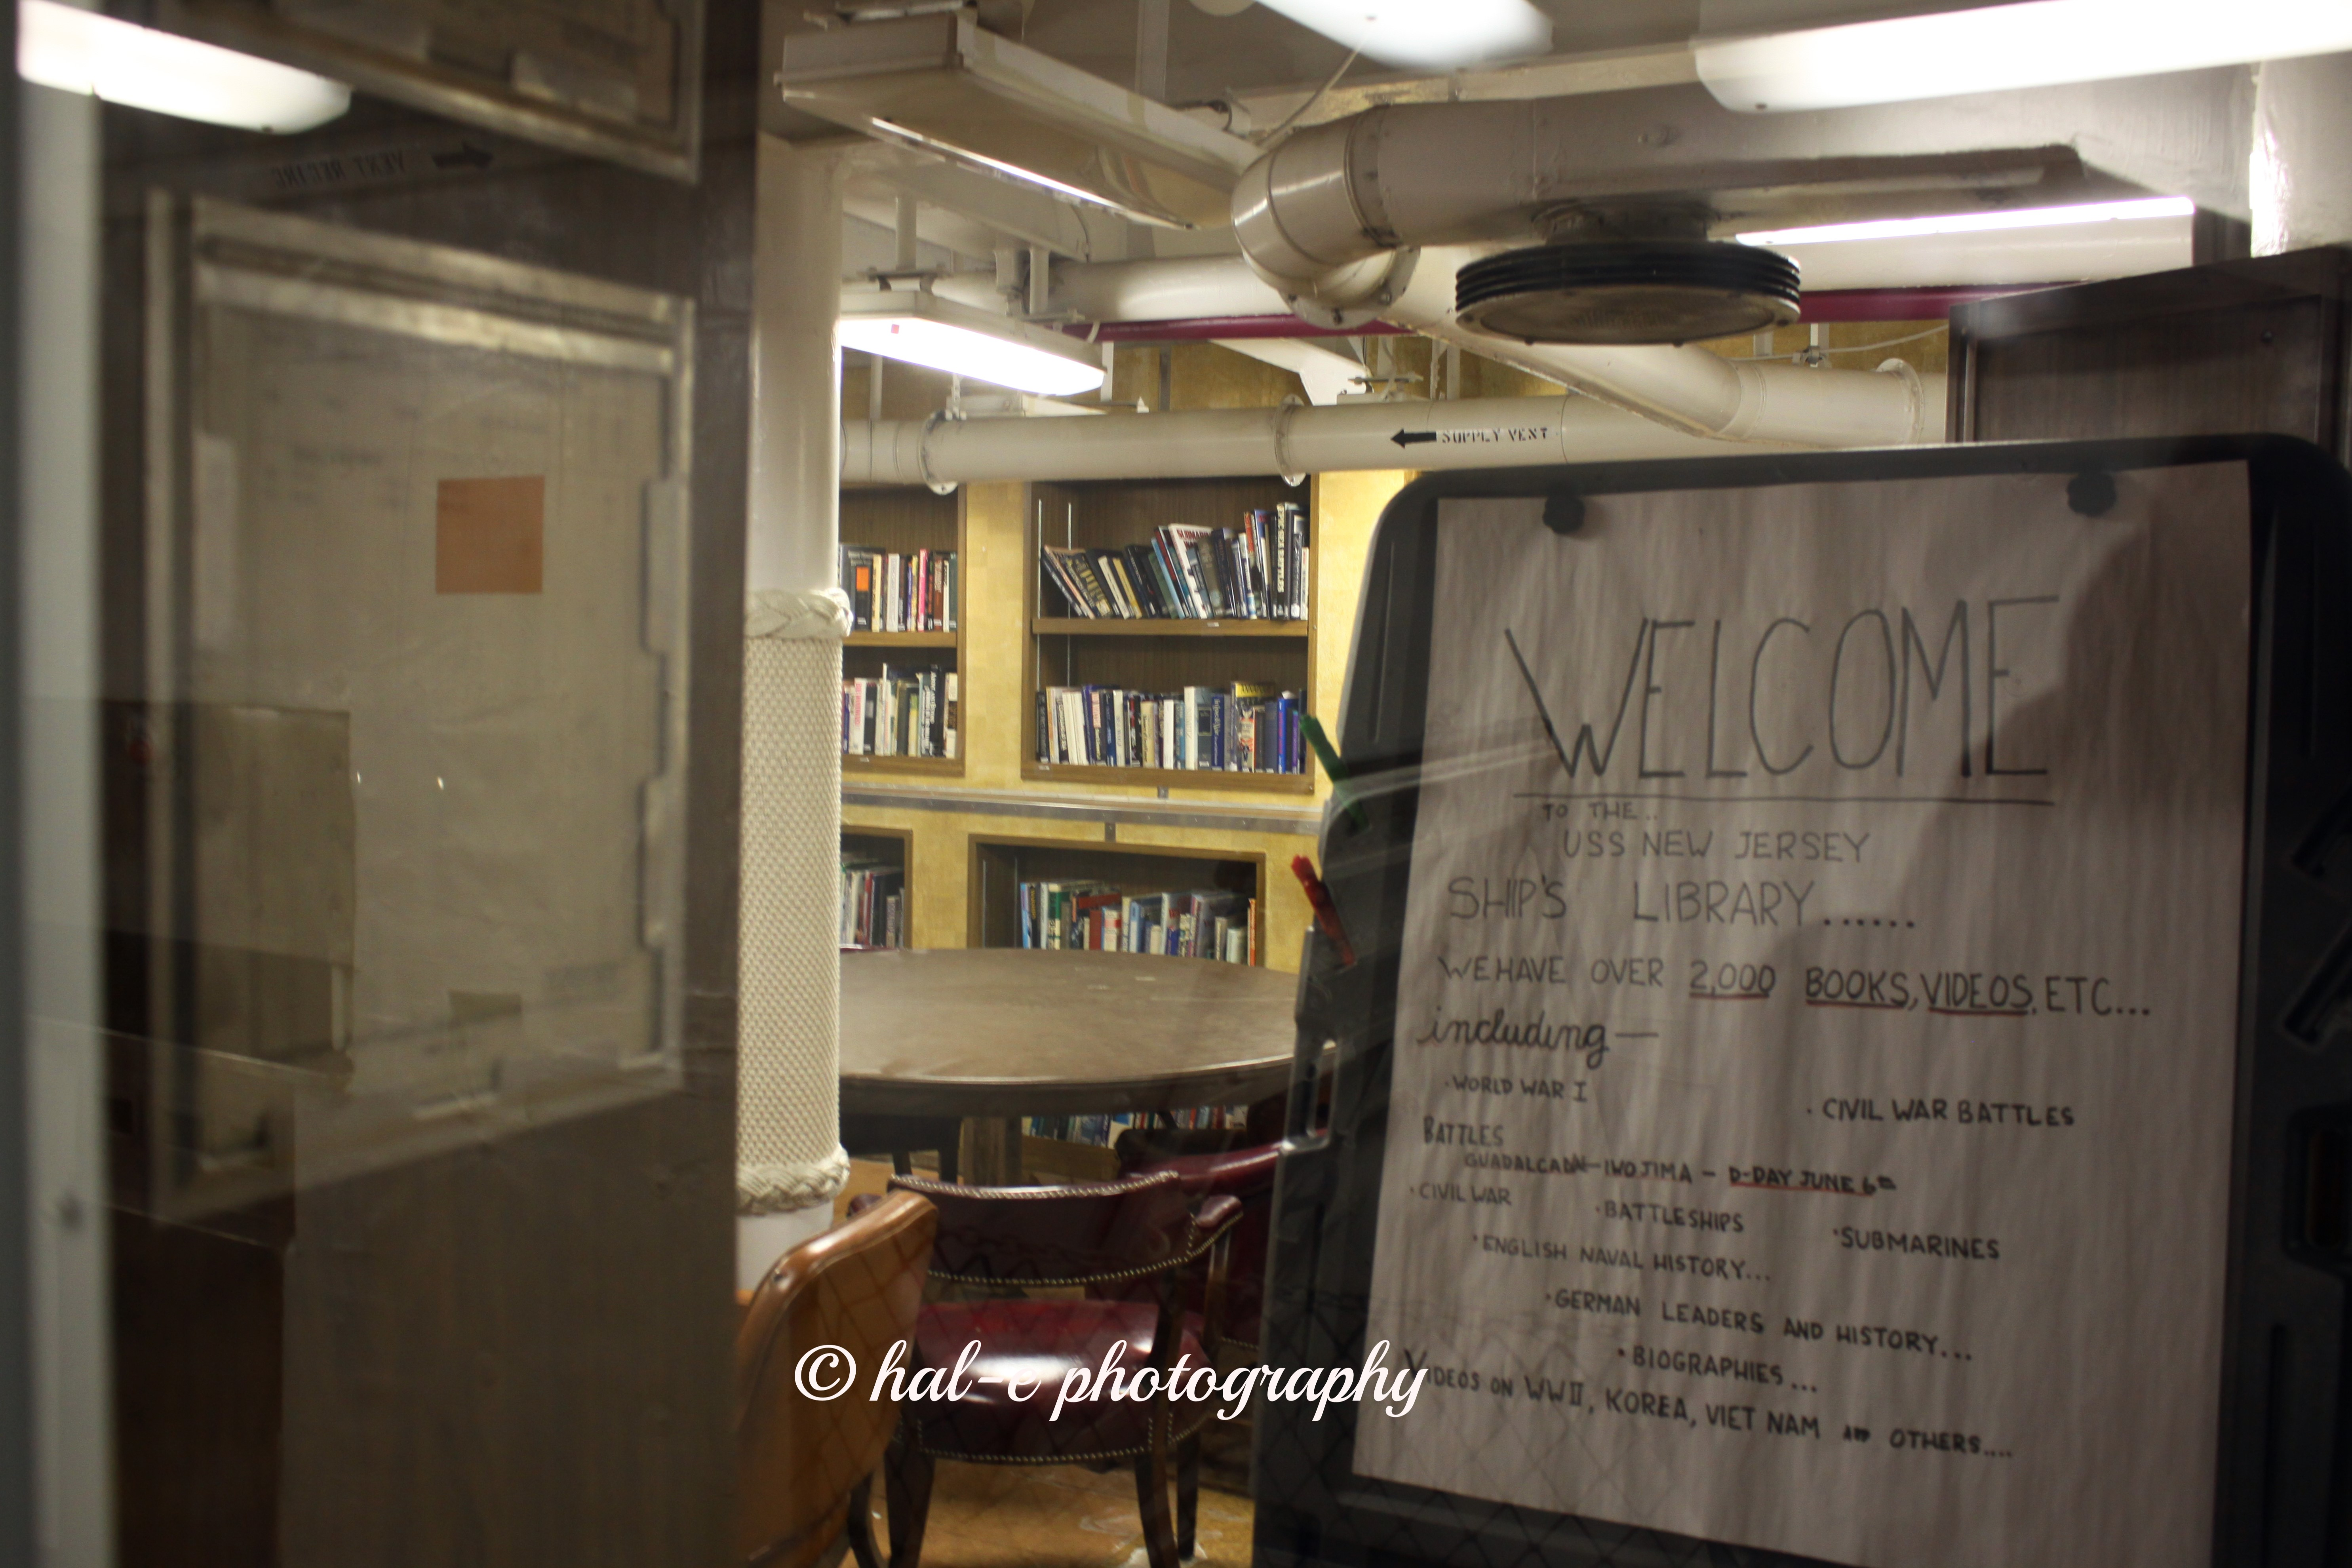 USS NJ Library